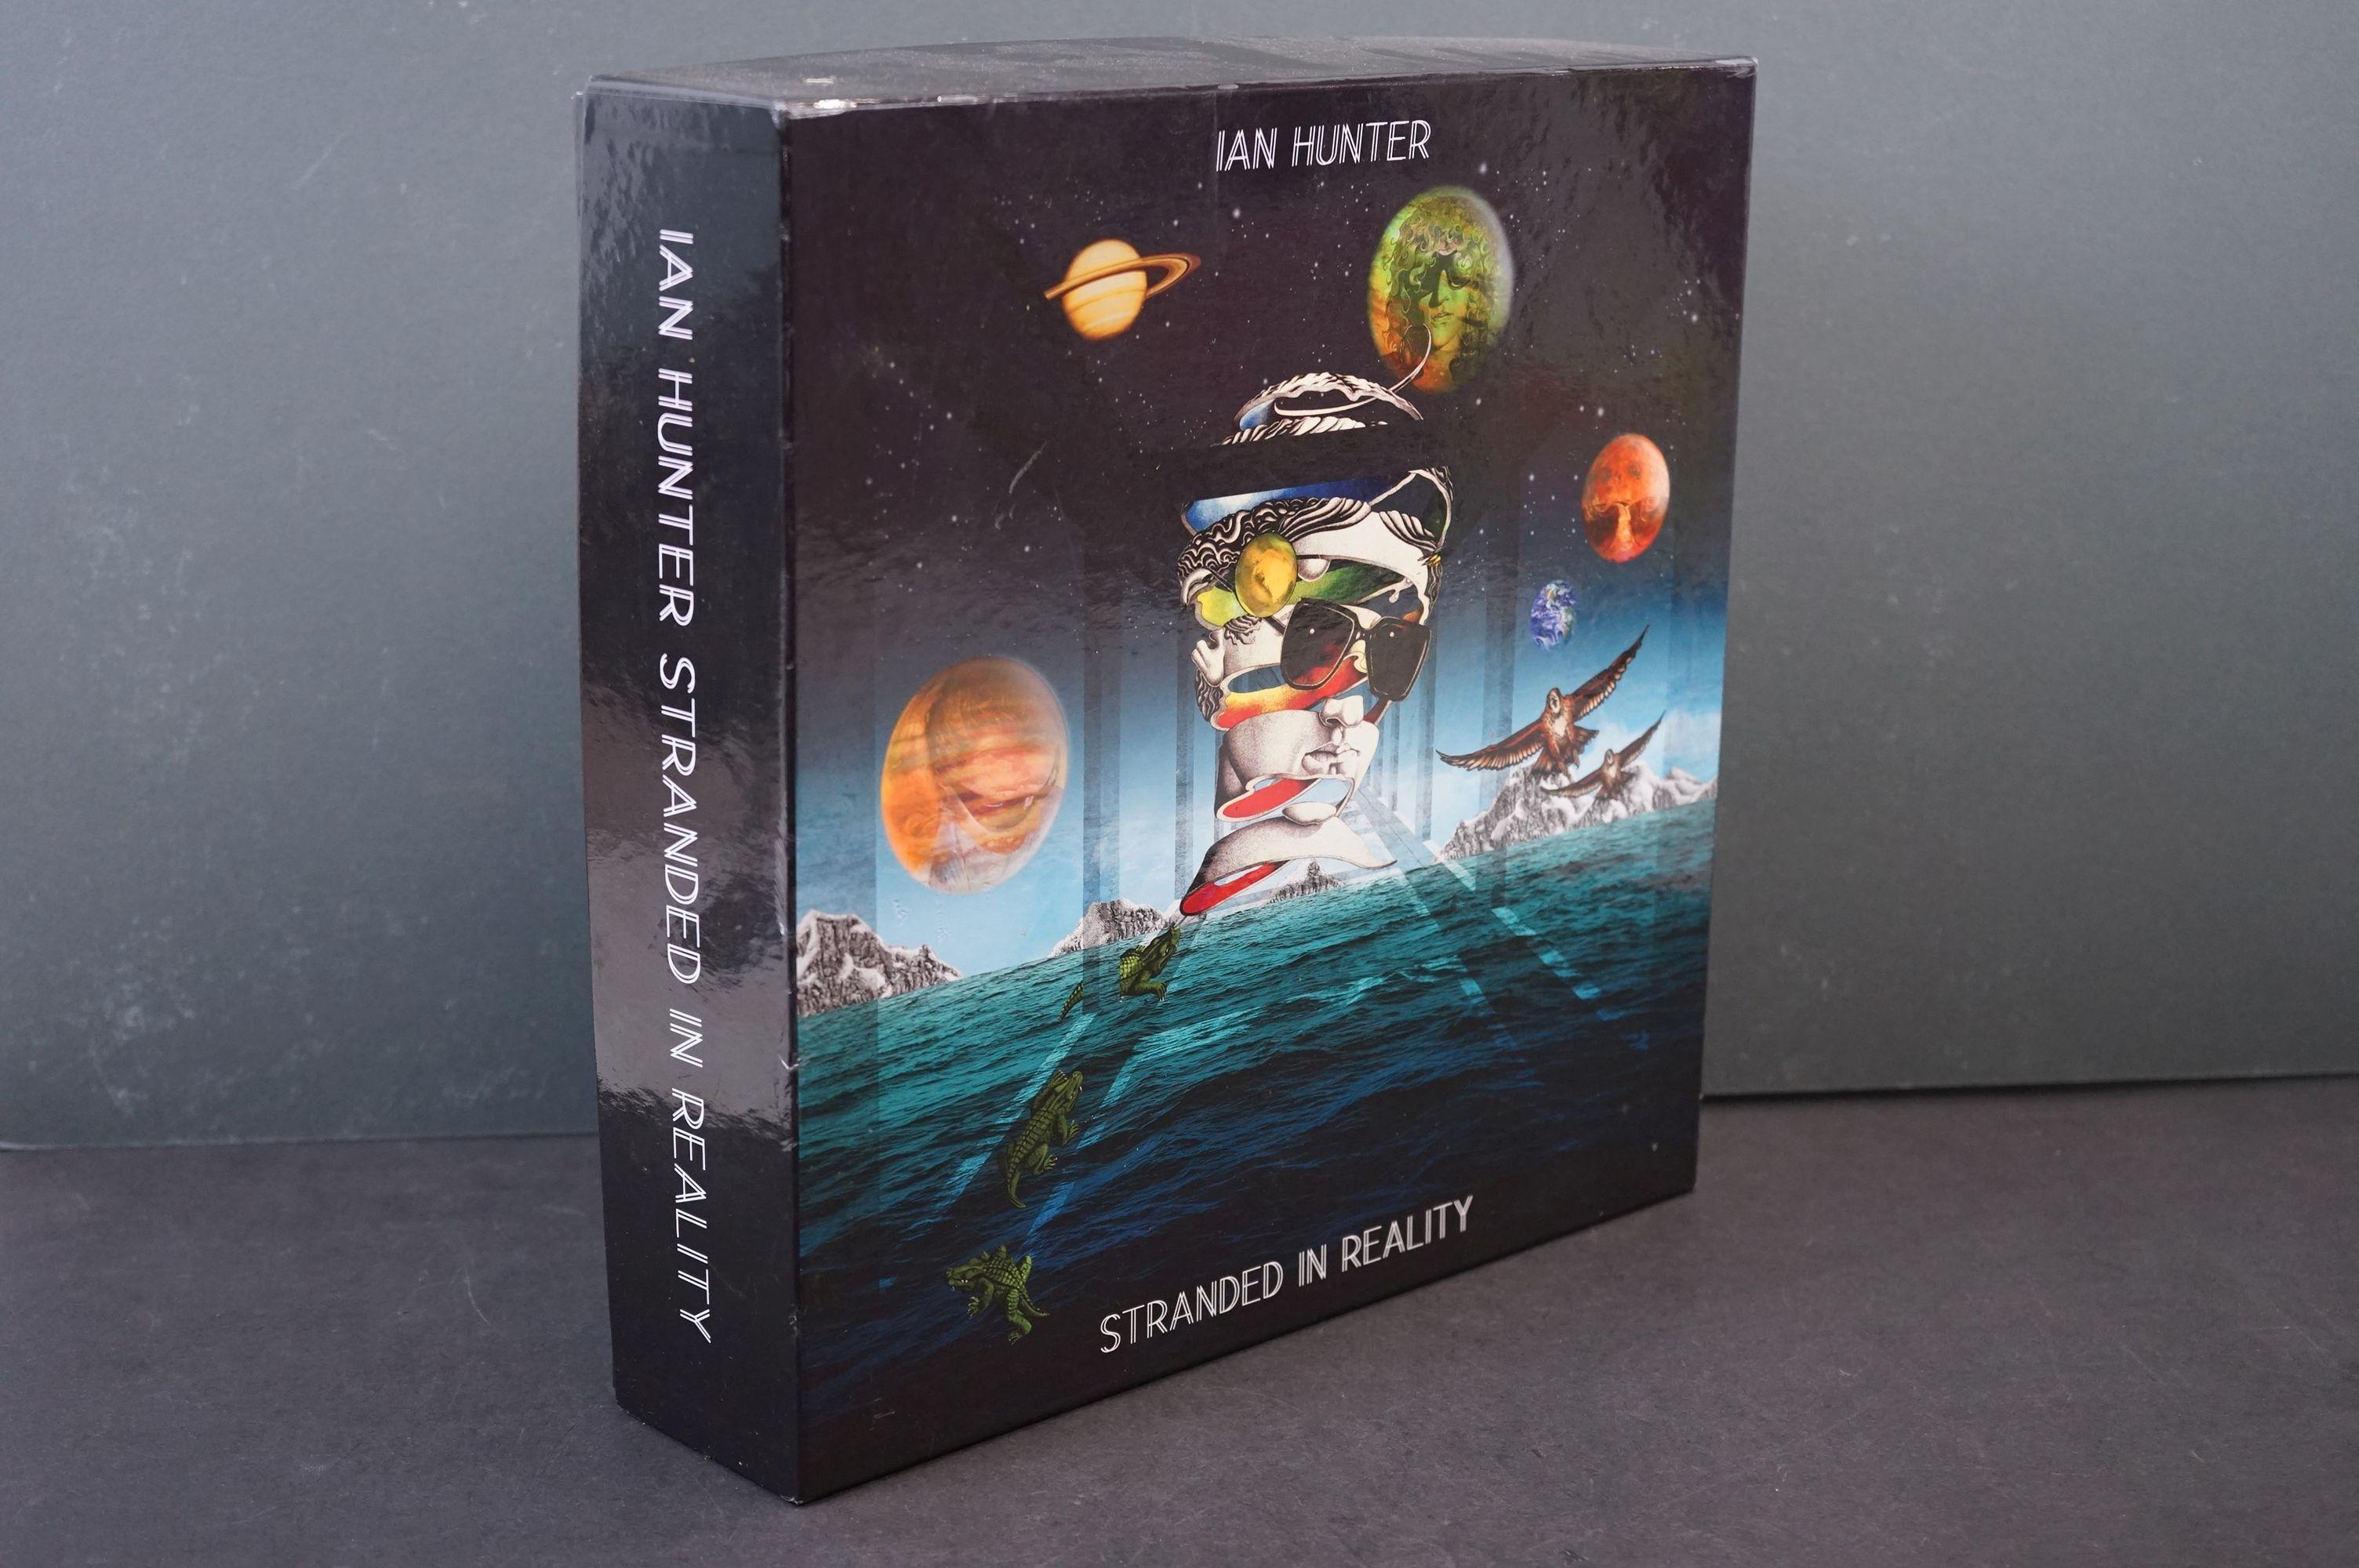 CD - Ian Hunter Stranded In Reality 30 Disc Box Set (2016) Proper Records, vg